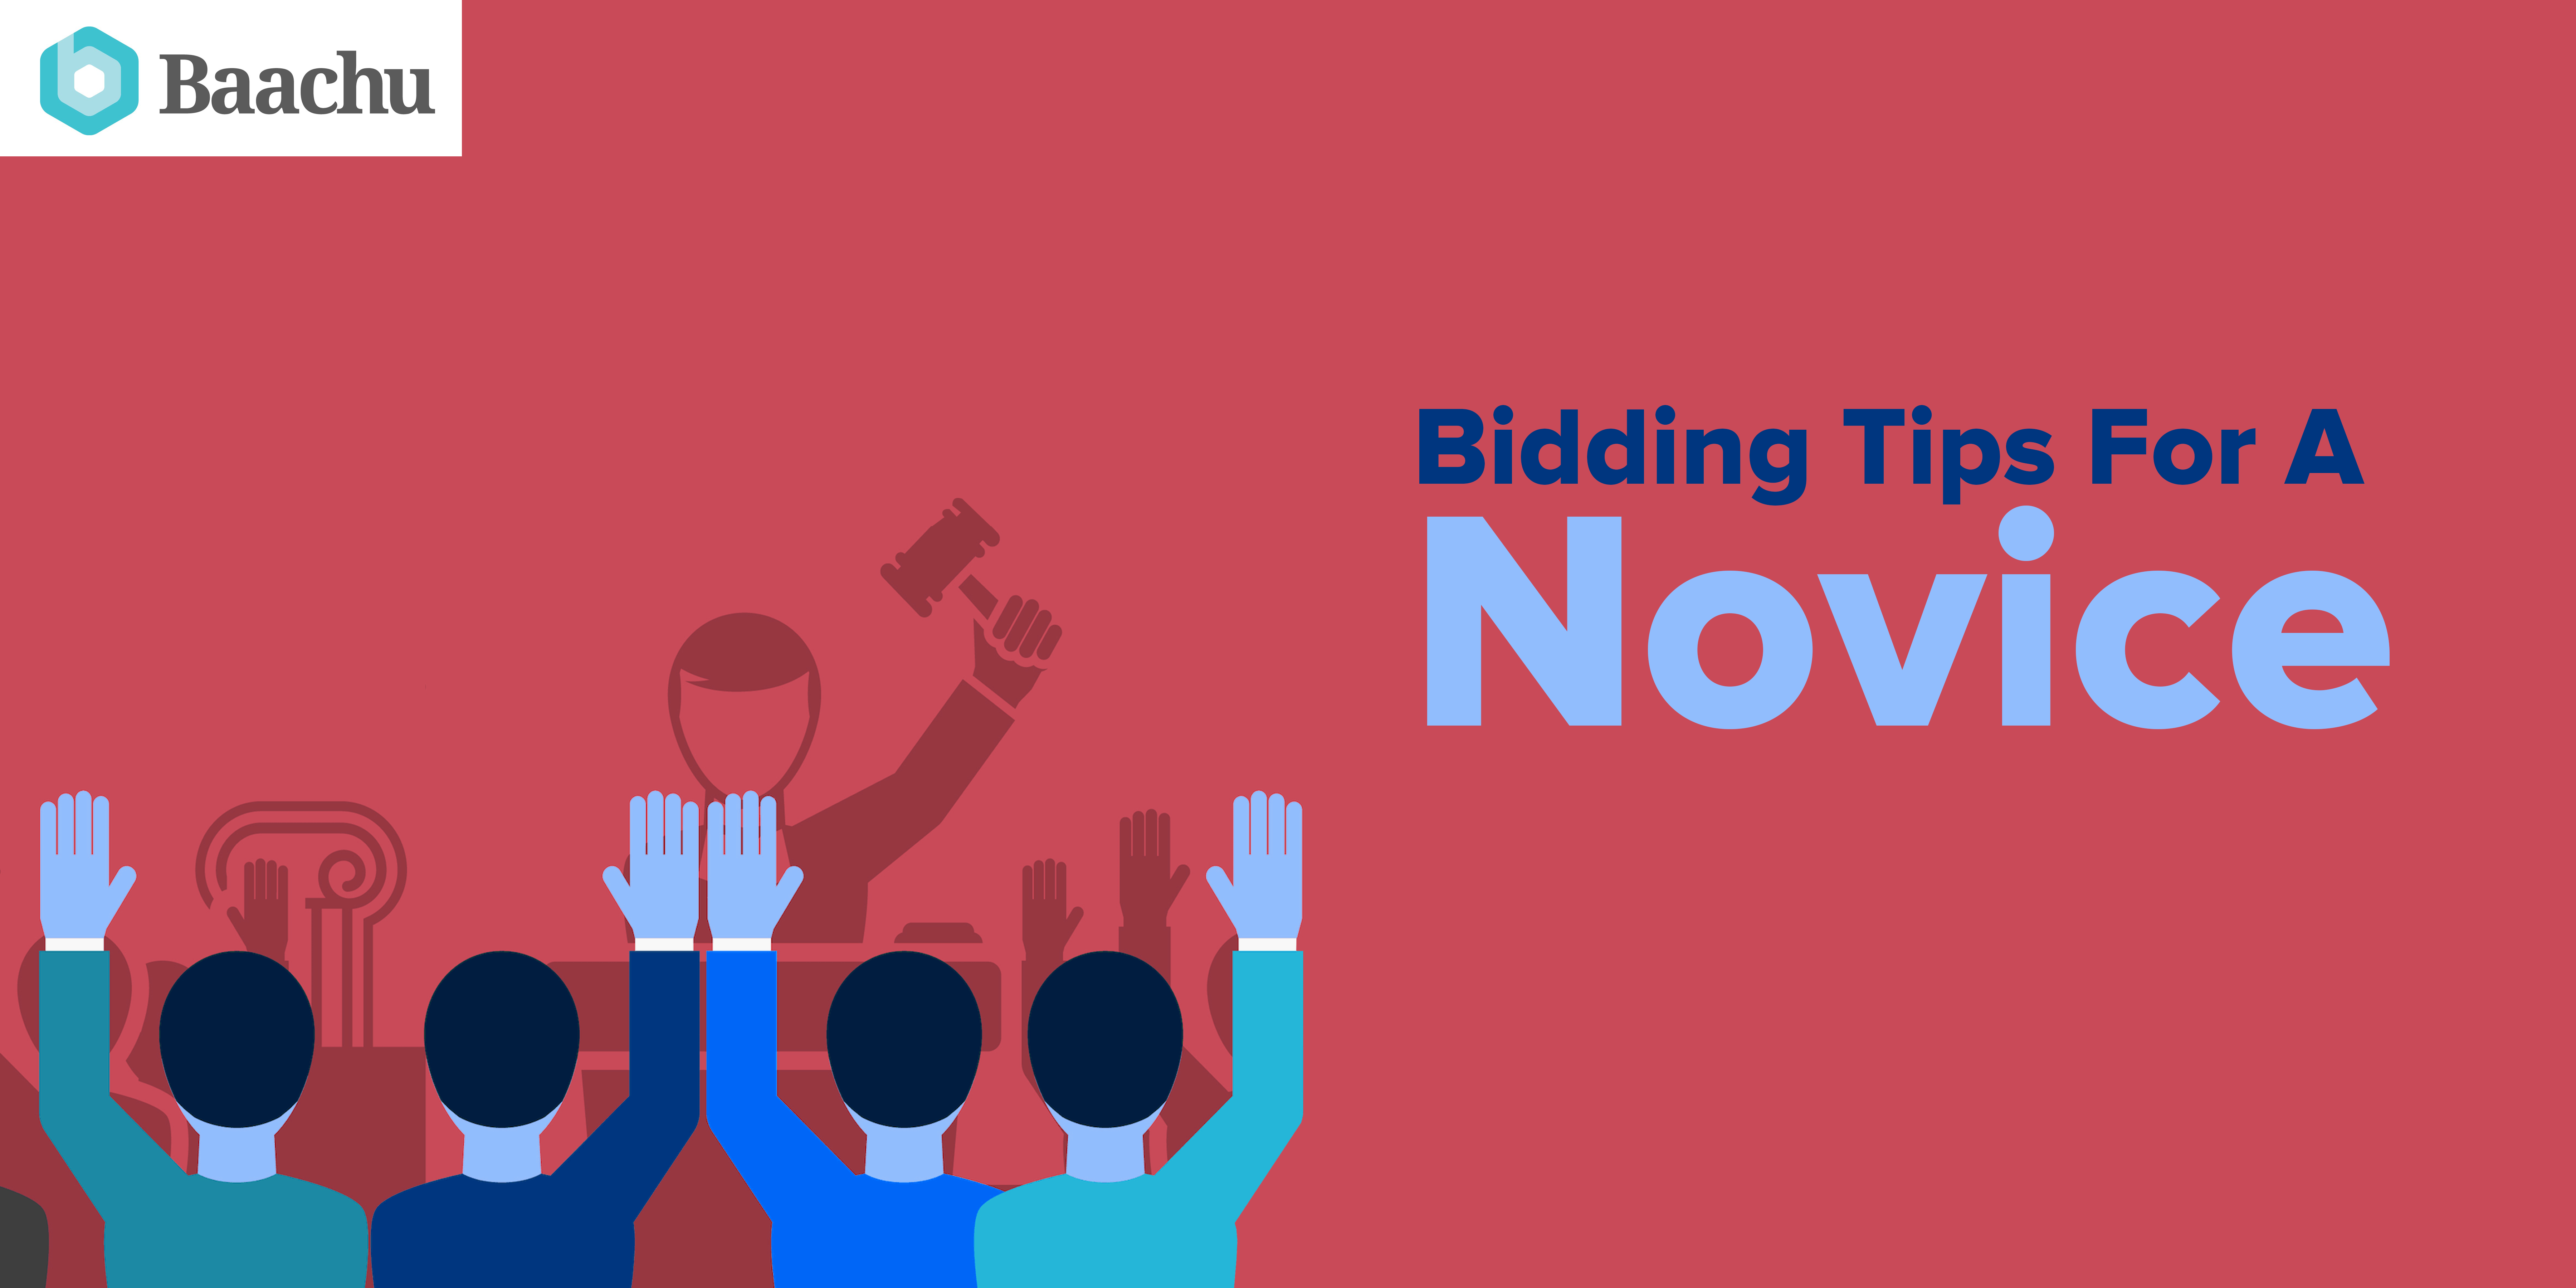 bidding tips for a novice